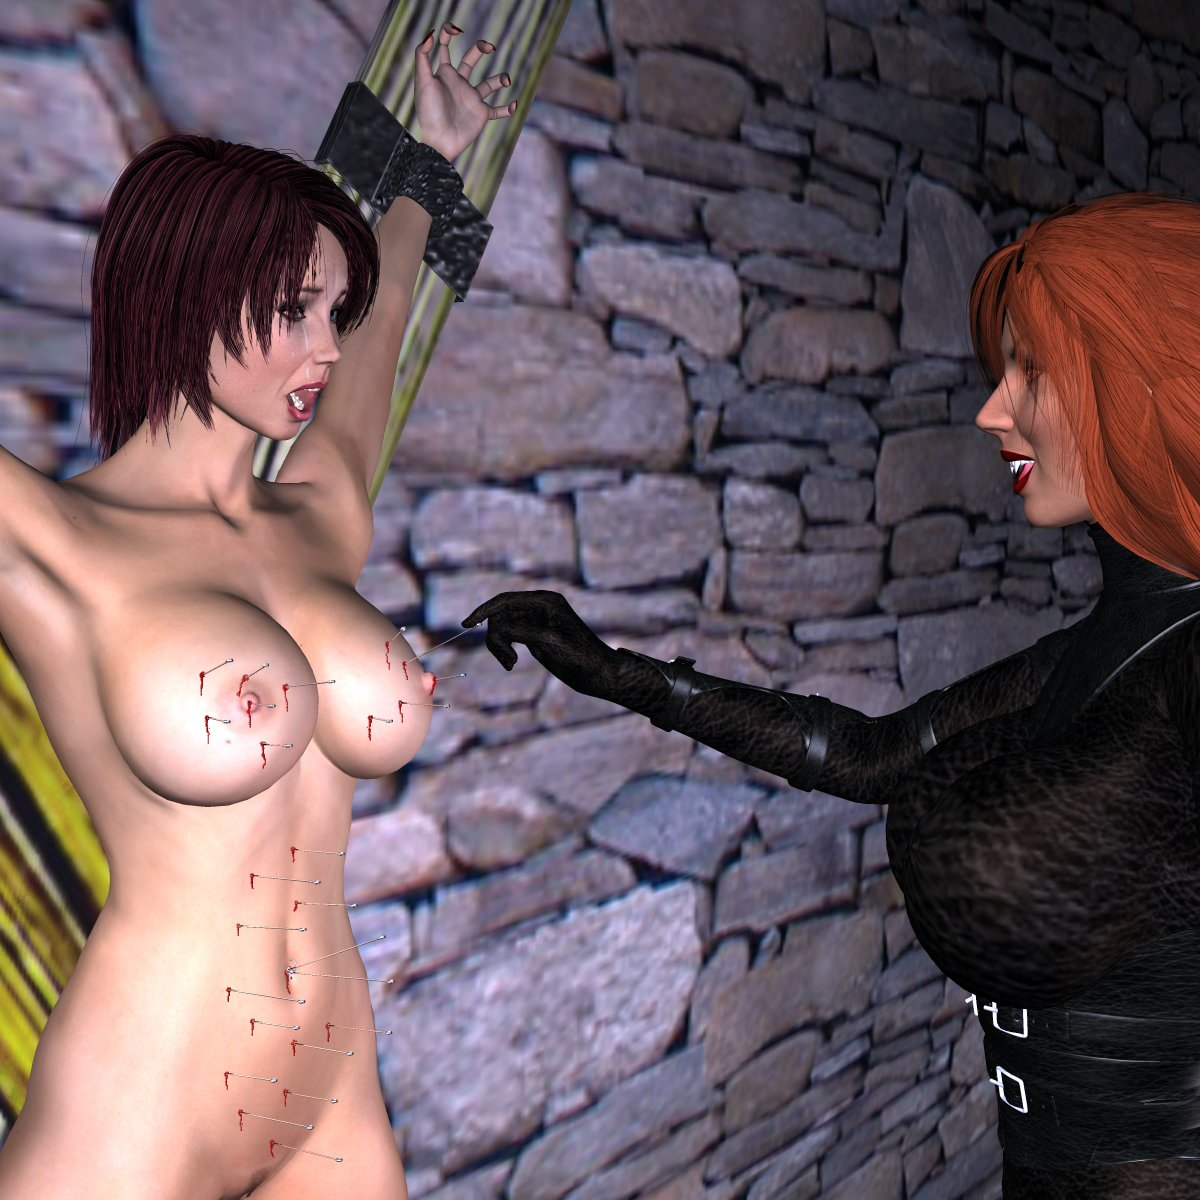 Nude pics phenix city adult images